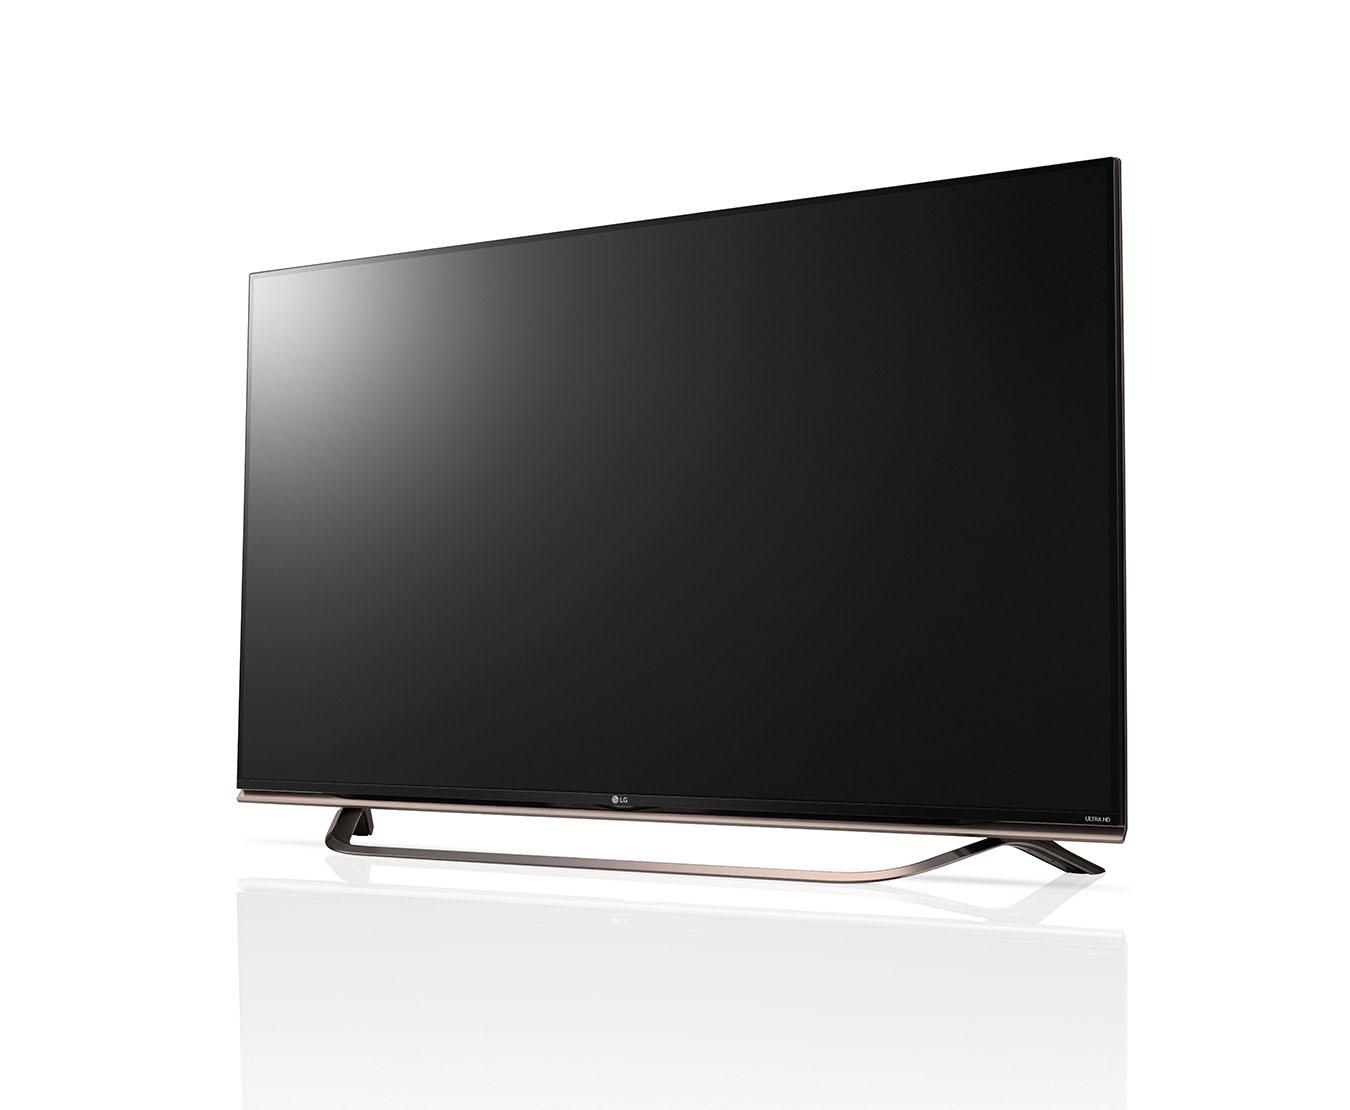 der lg 79uf8609 79 zoll ultra hd 3d flachbildfernseher im. Black Bedroom Furniture Sets. Home Design Ideas